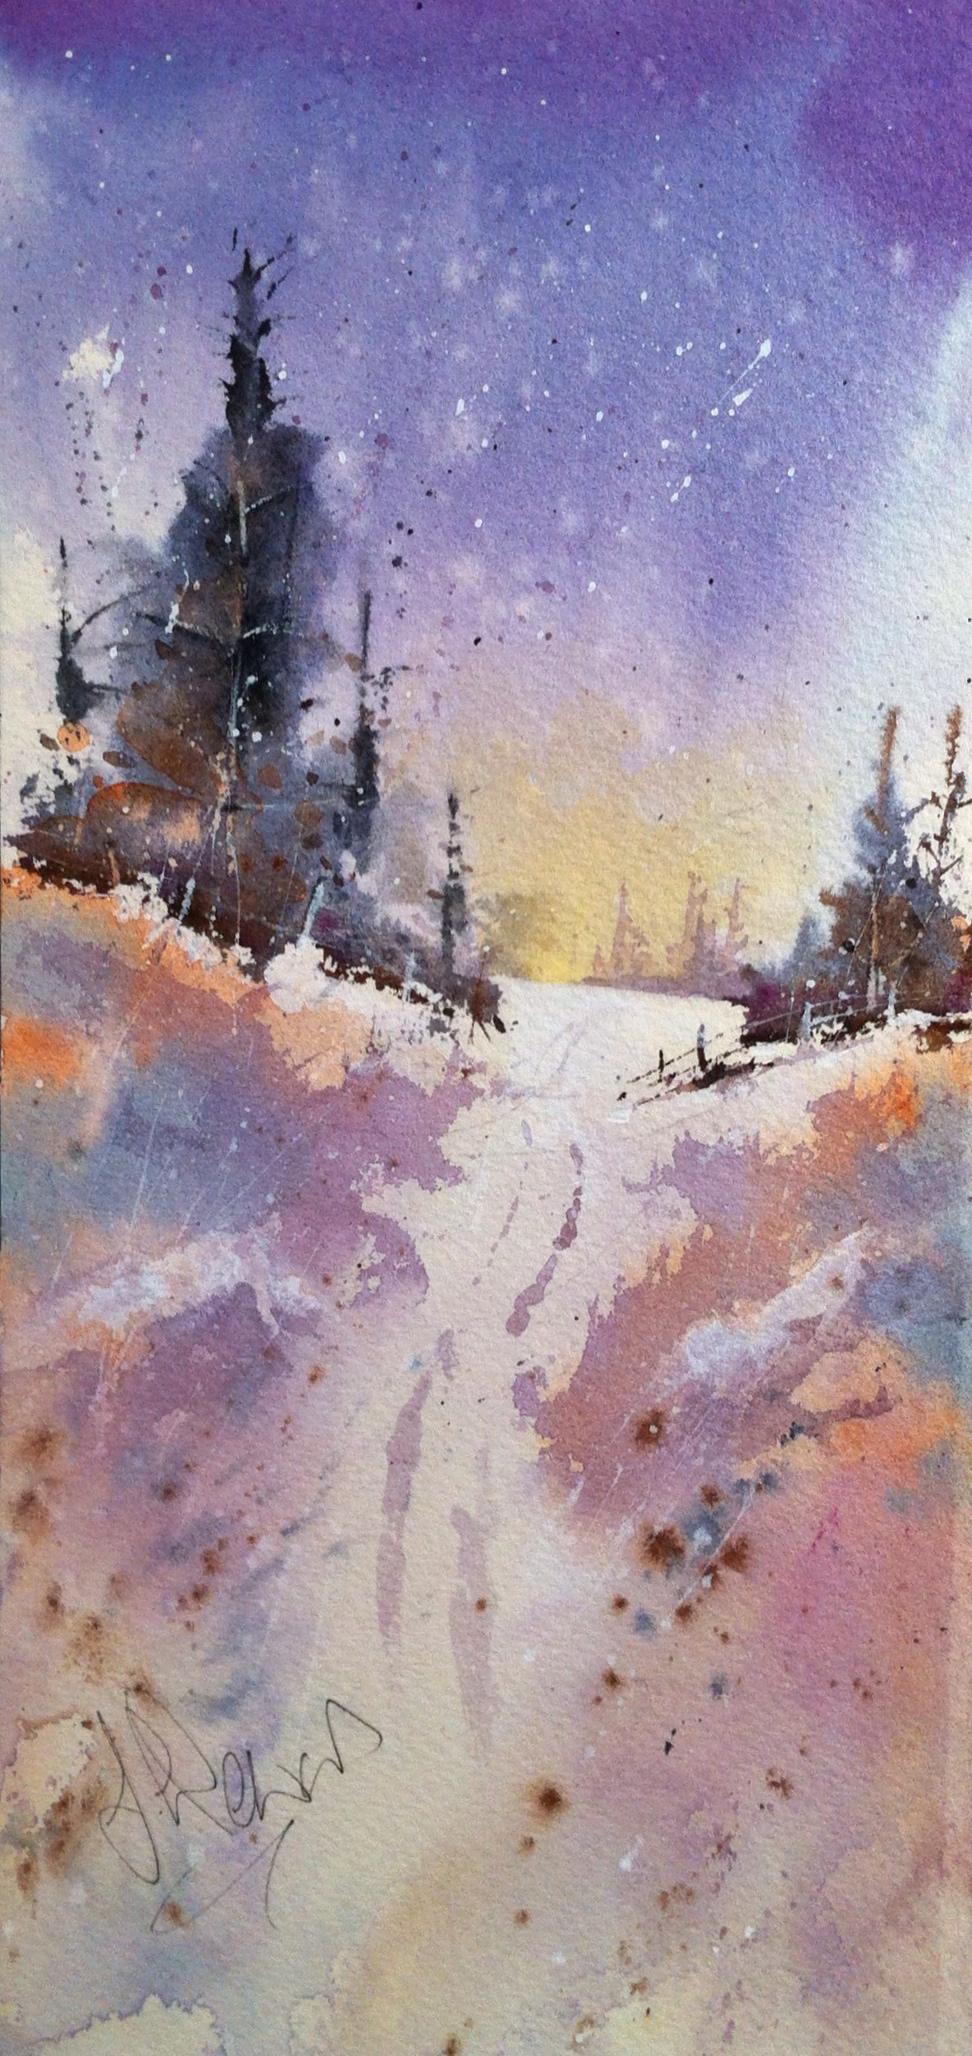 Early Morning Snowfall